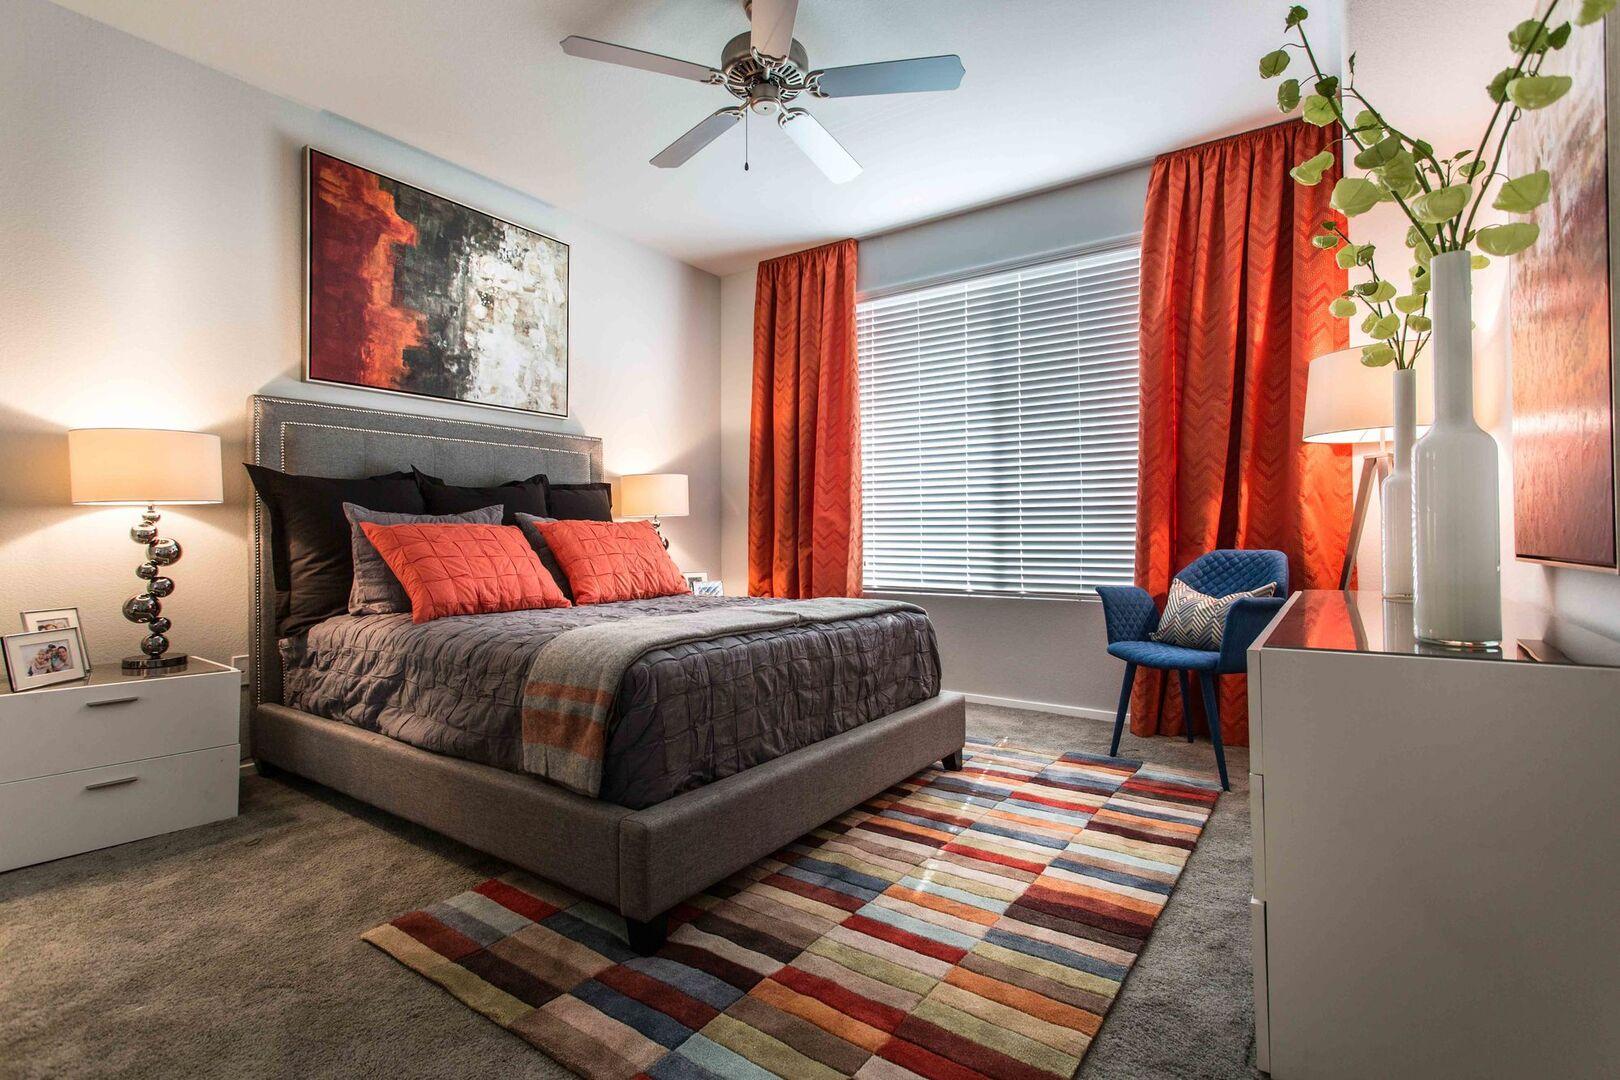 Phoenix az apartments trillium 44 apartments - Cheap 2 bedroom apartments in phoenix az ...